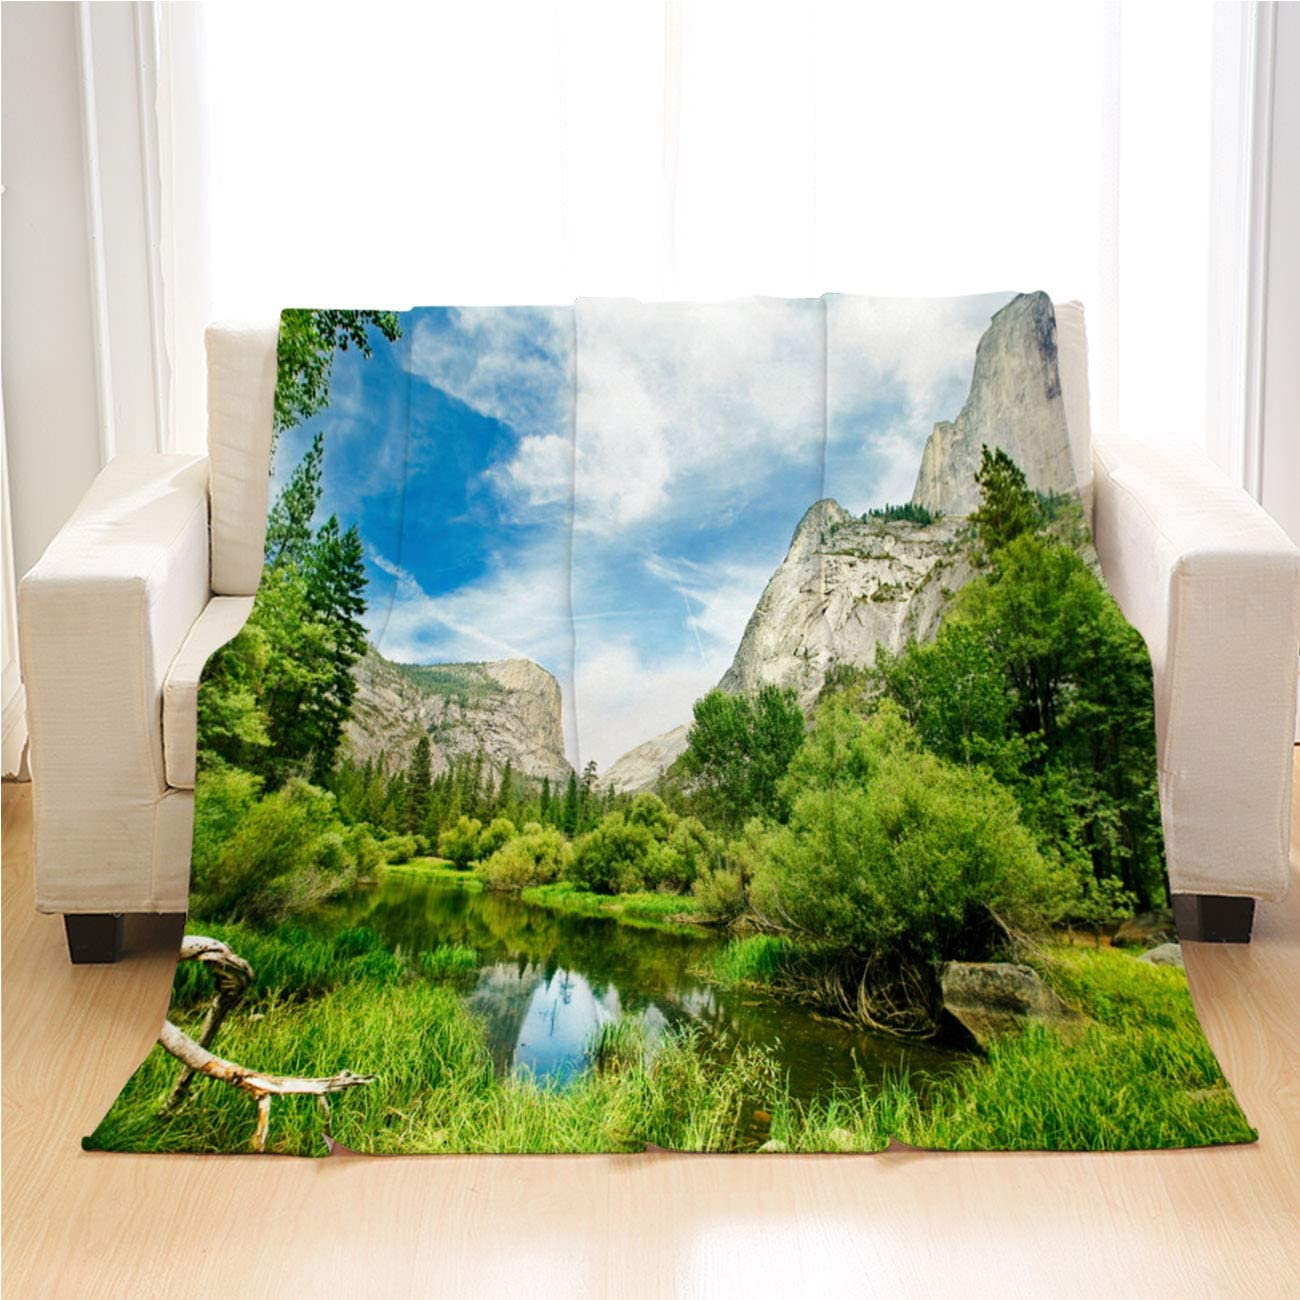 OTTOSUN Yosemite Blanket Luxury Throw ショッピング Soft Super Yosemit 激安格安割引情報満載